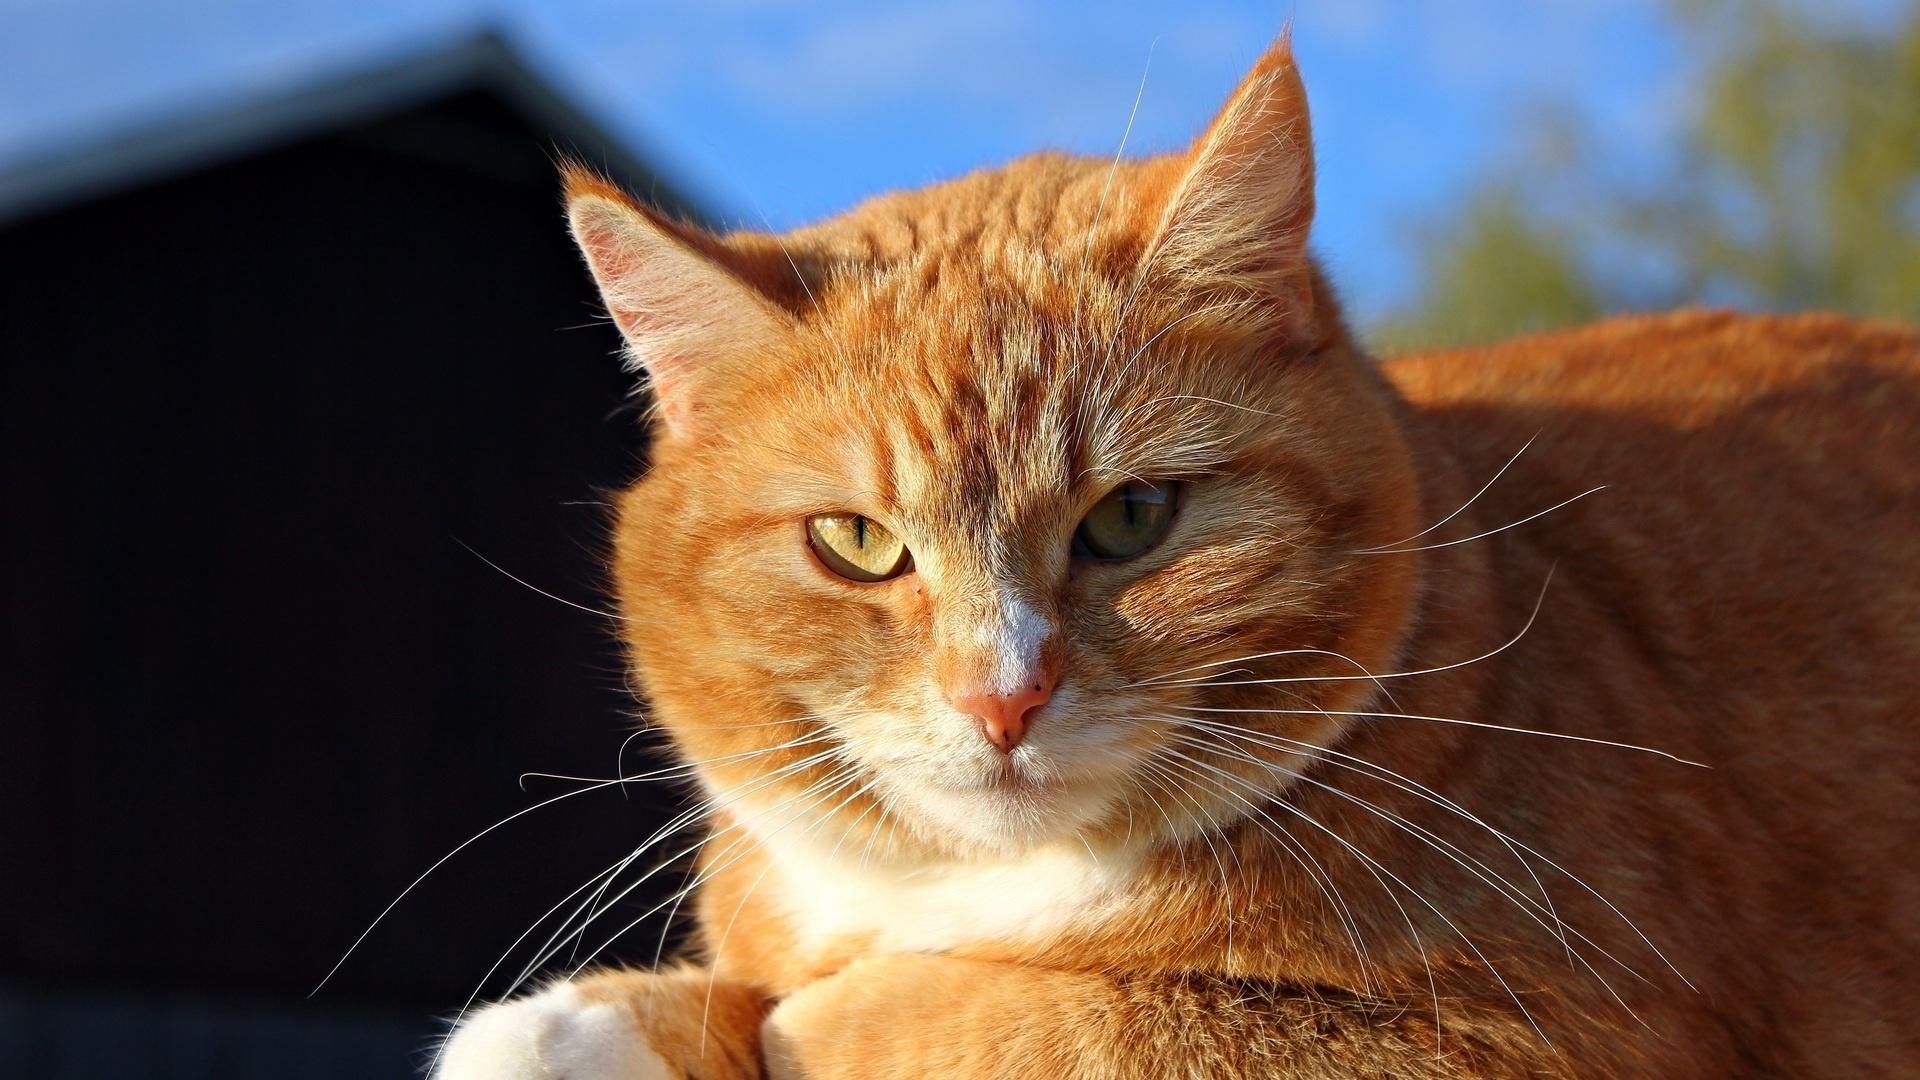 Ginger Cat Image